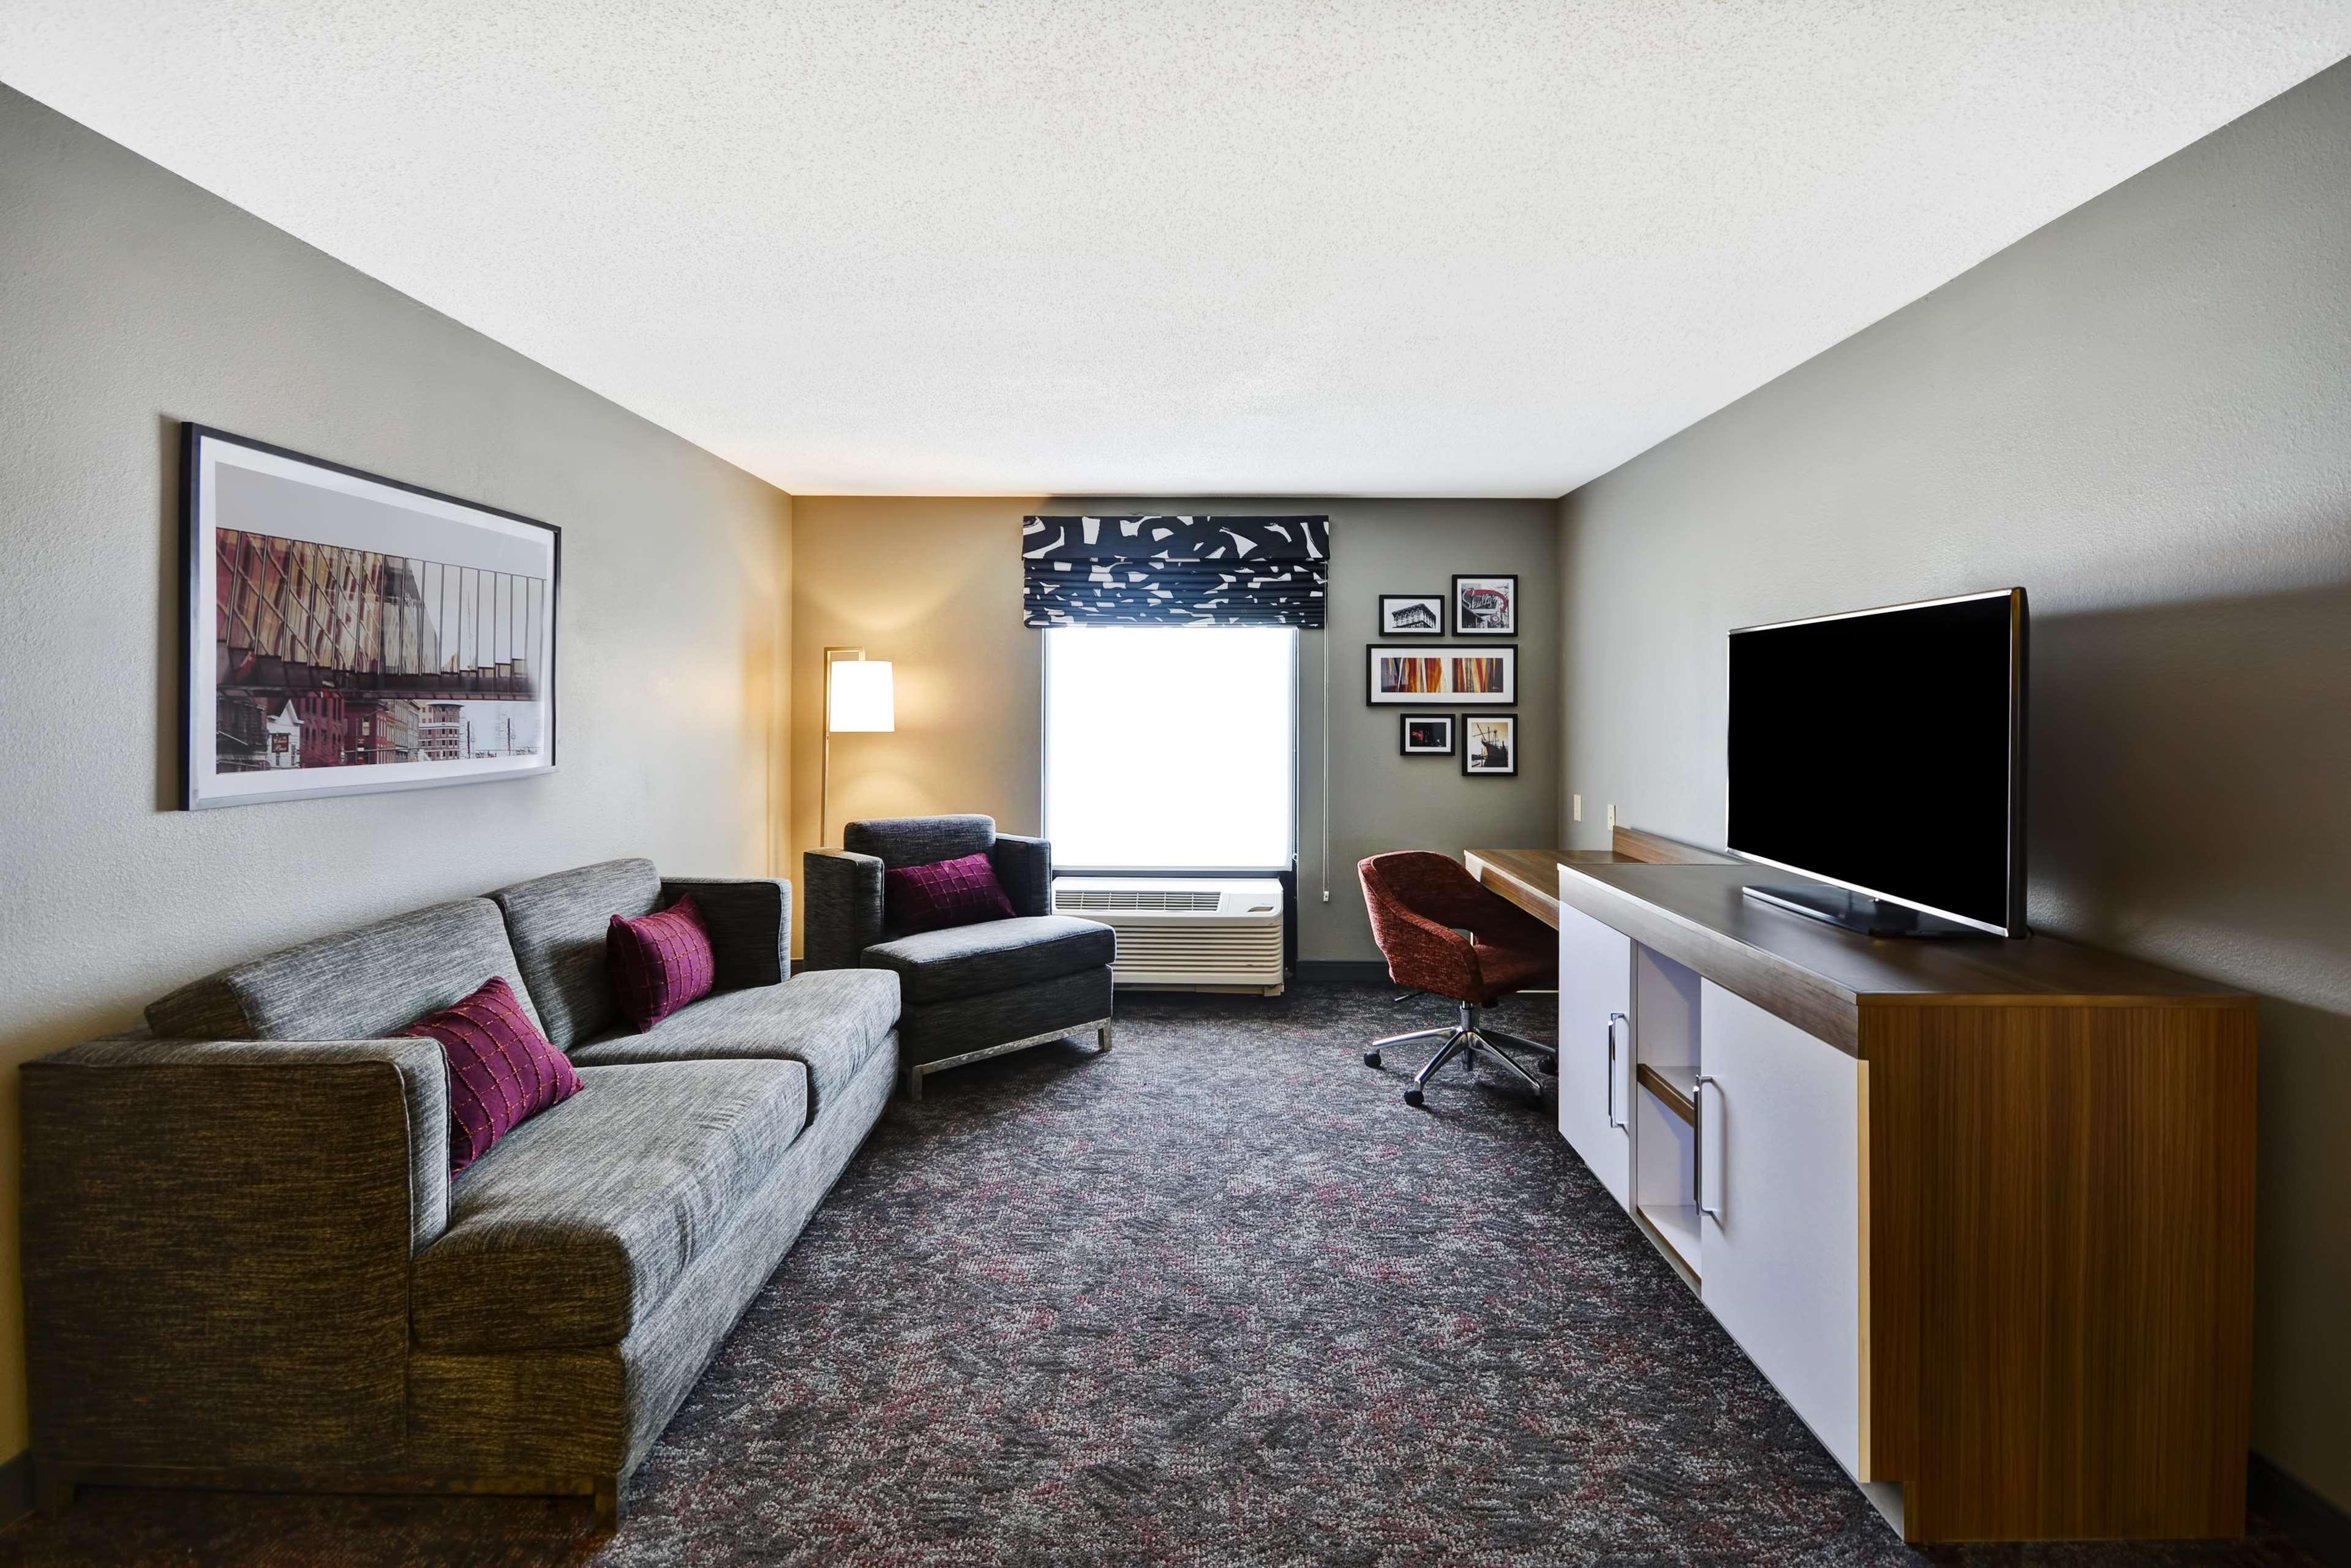 Hampton Inn & Suites Columbus-Easton Area image 49